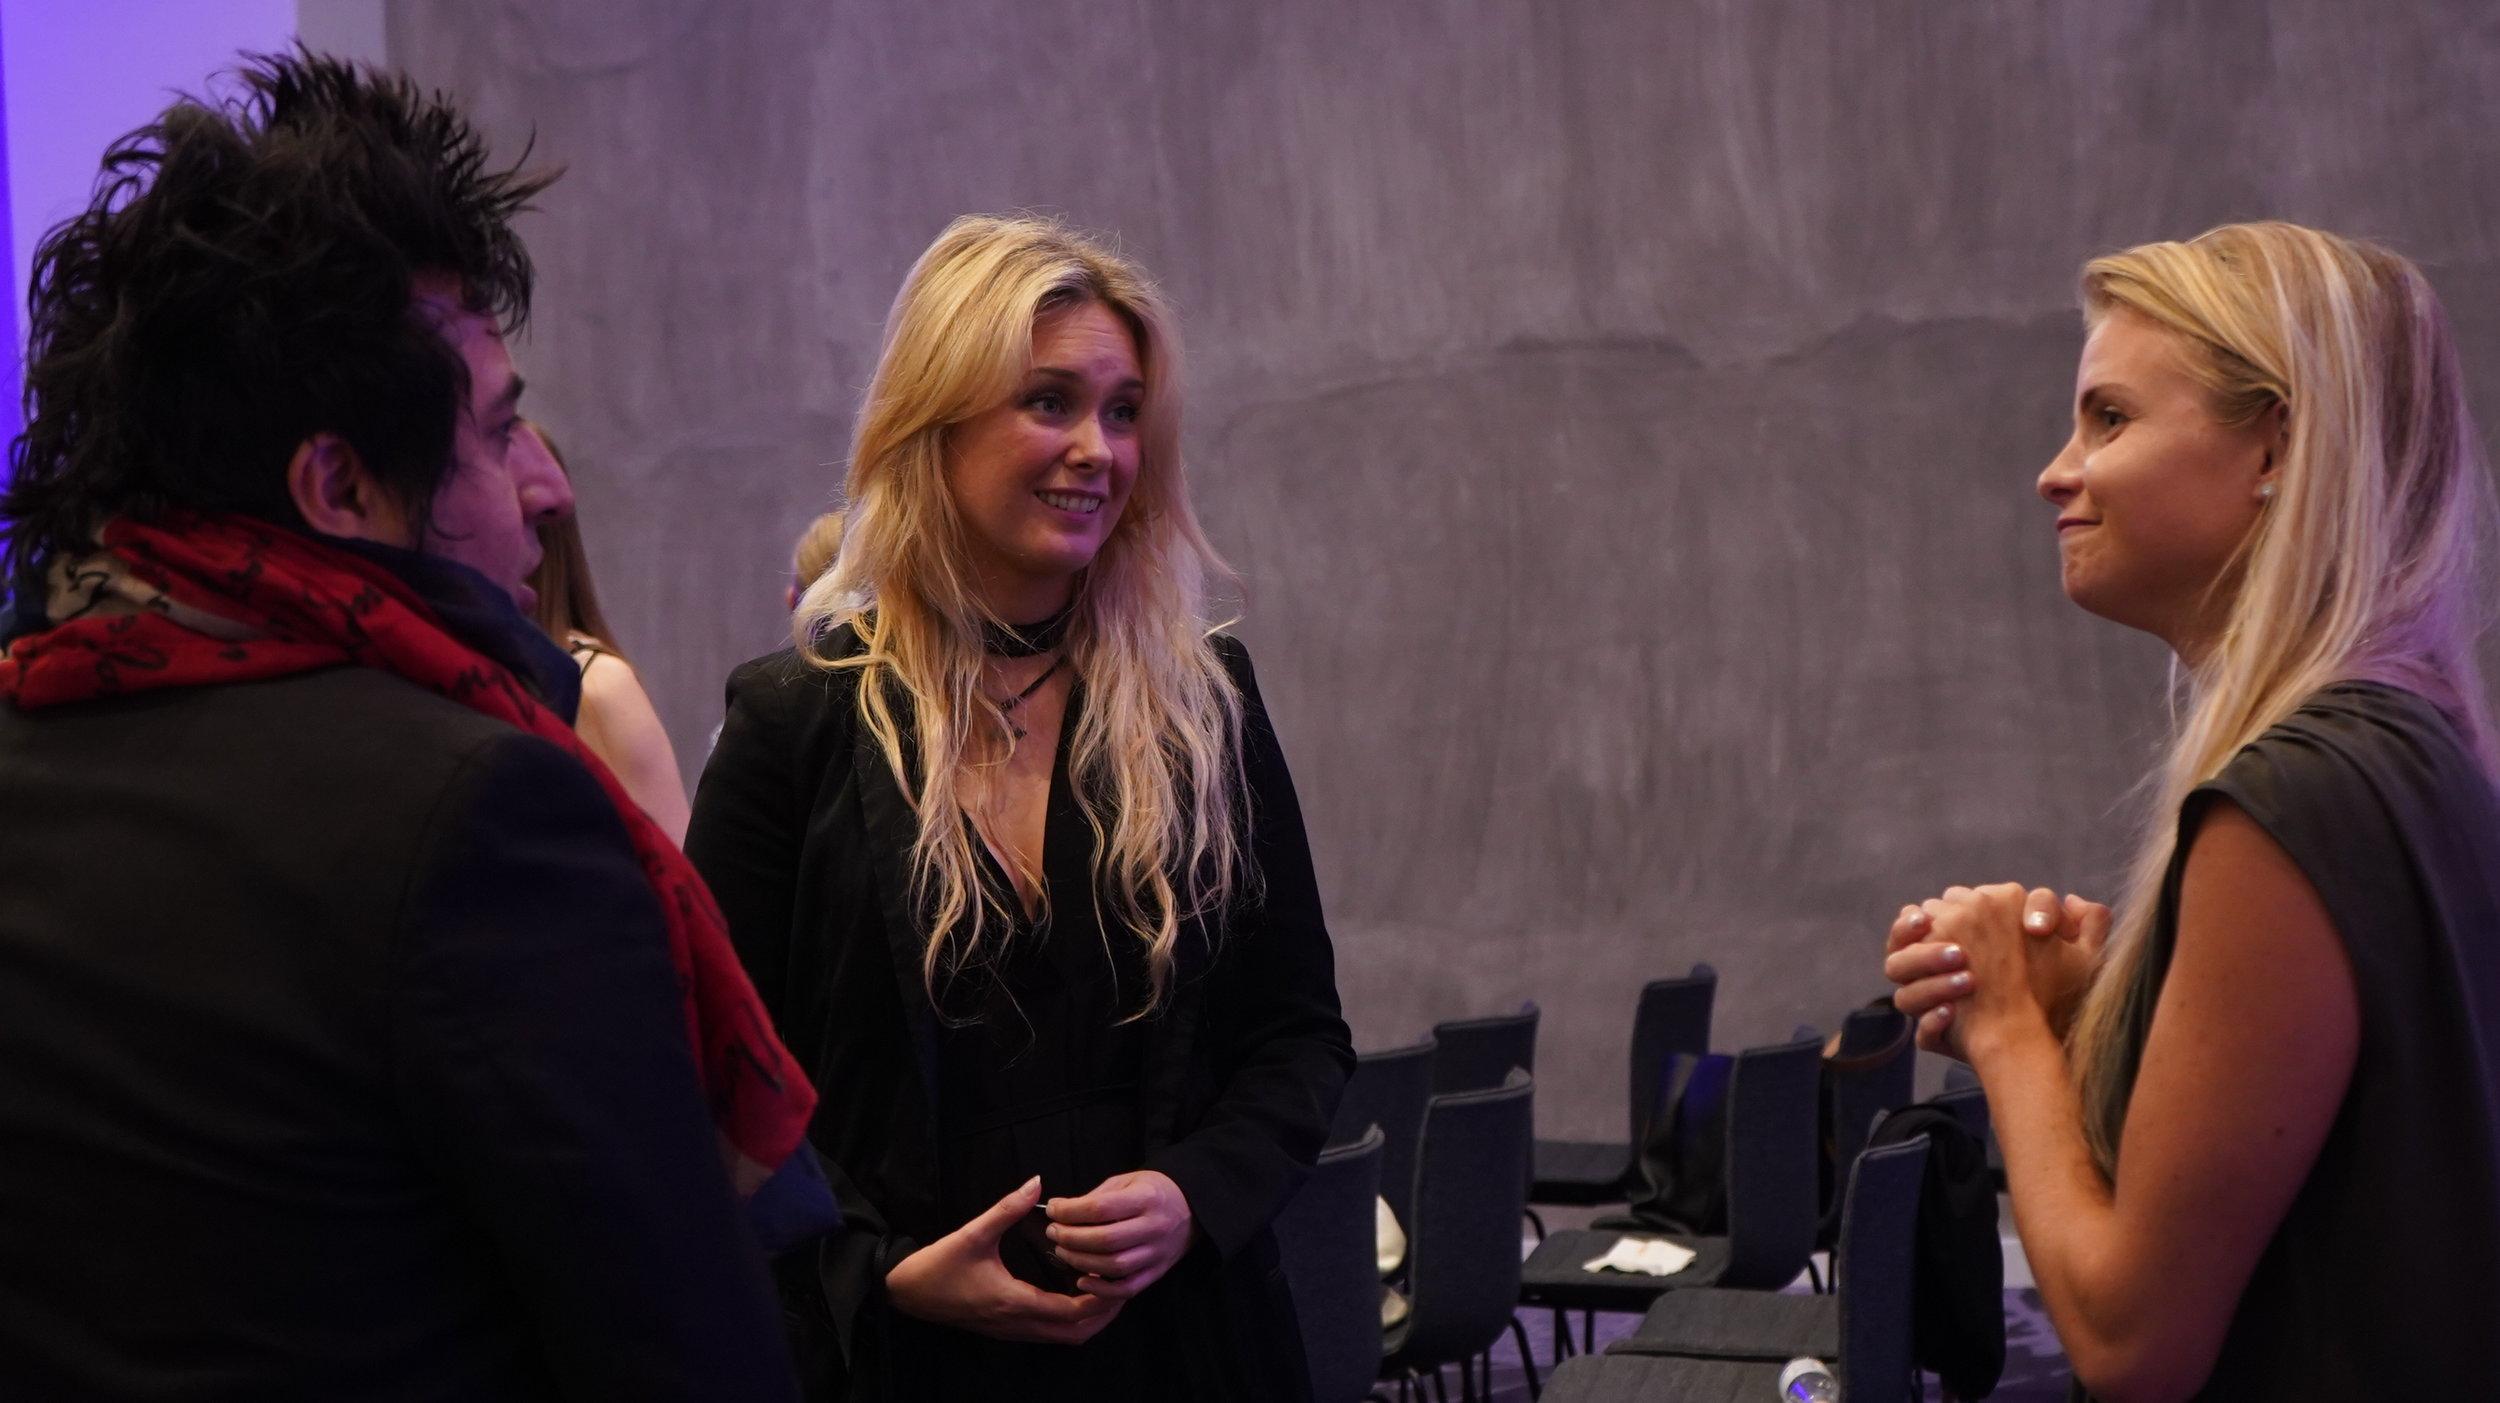 Christina and Kristina at Travel Summit 2019.JPG